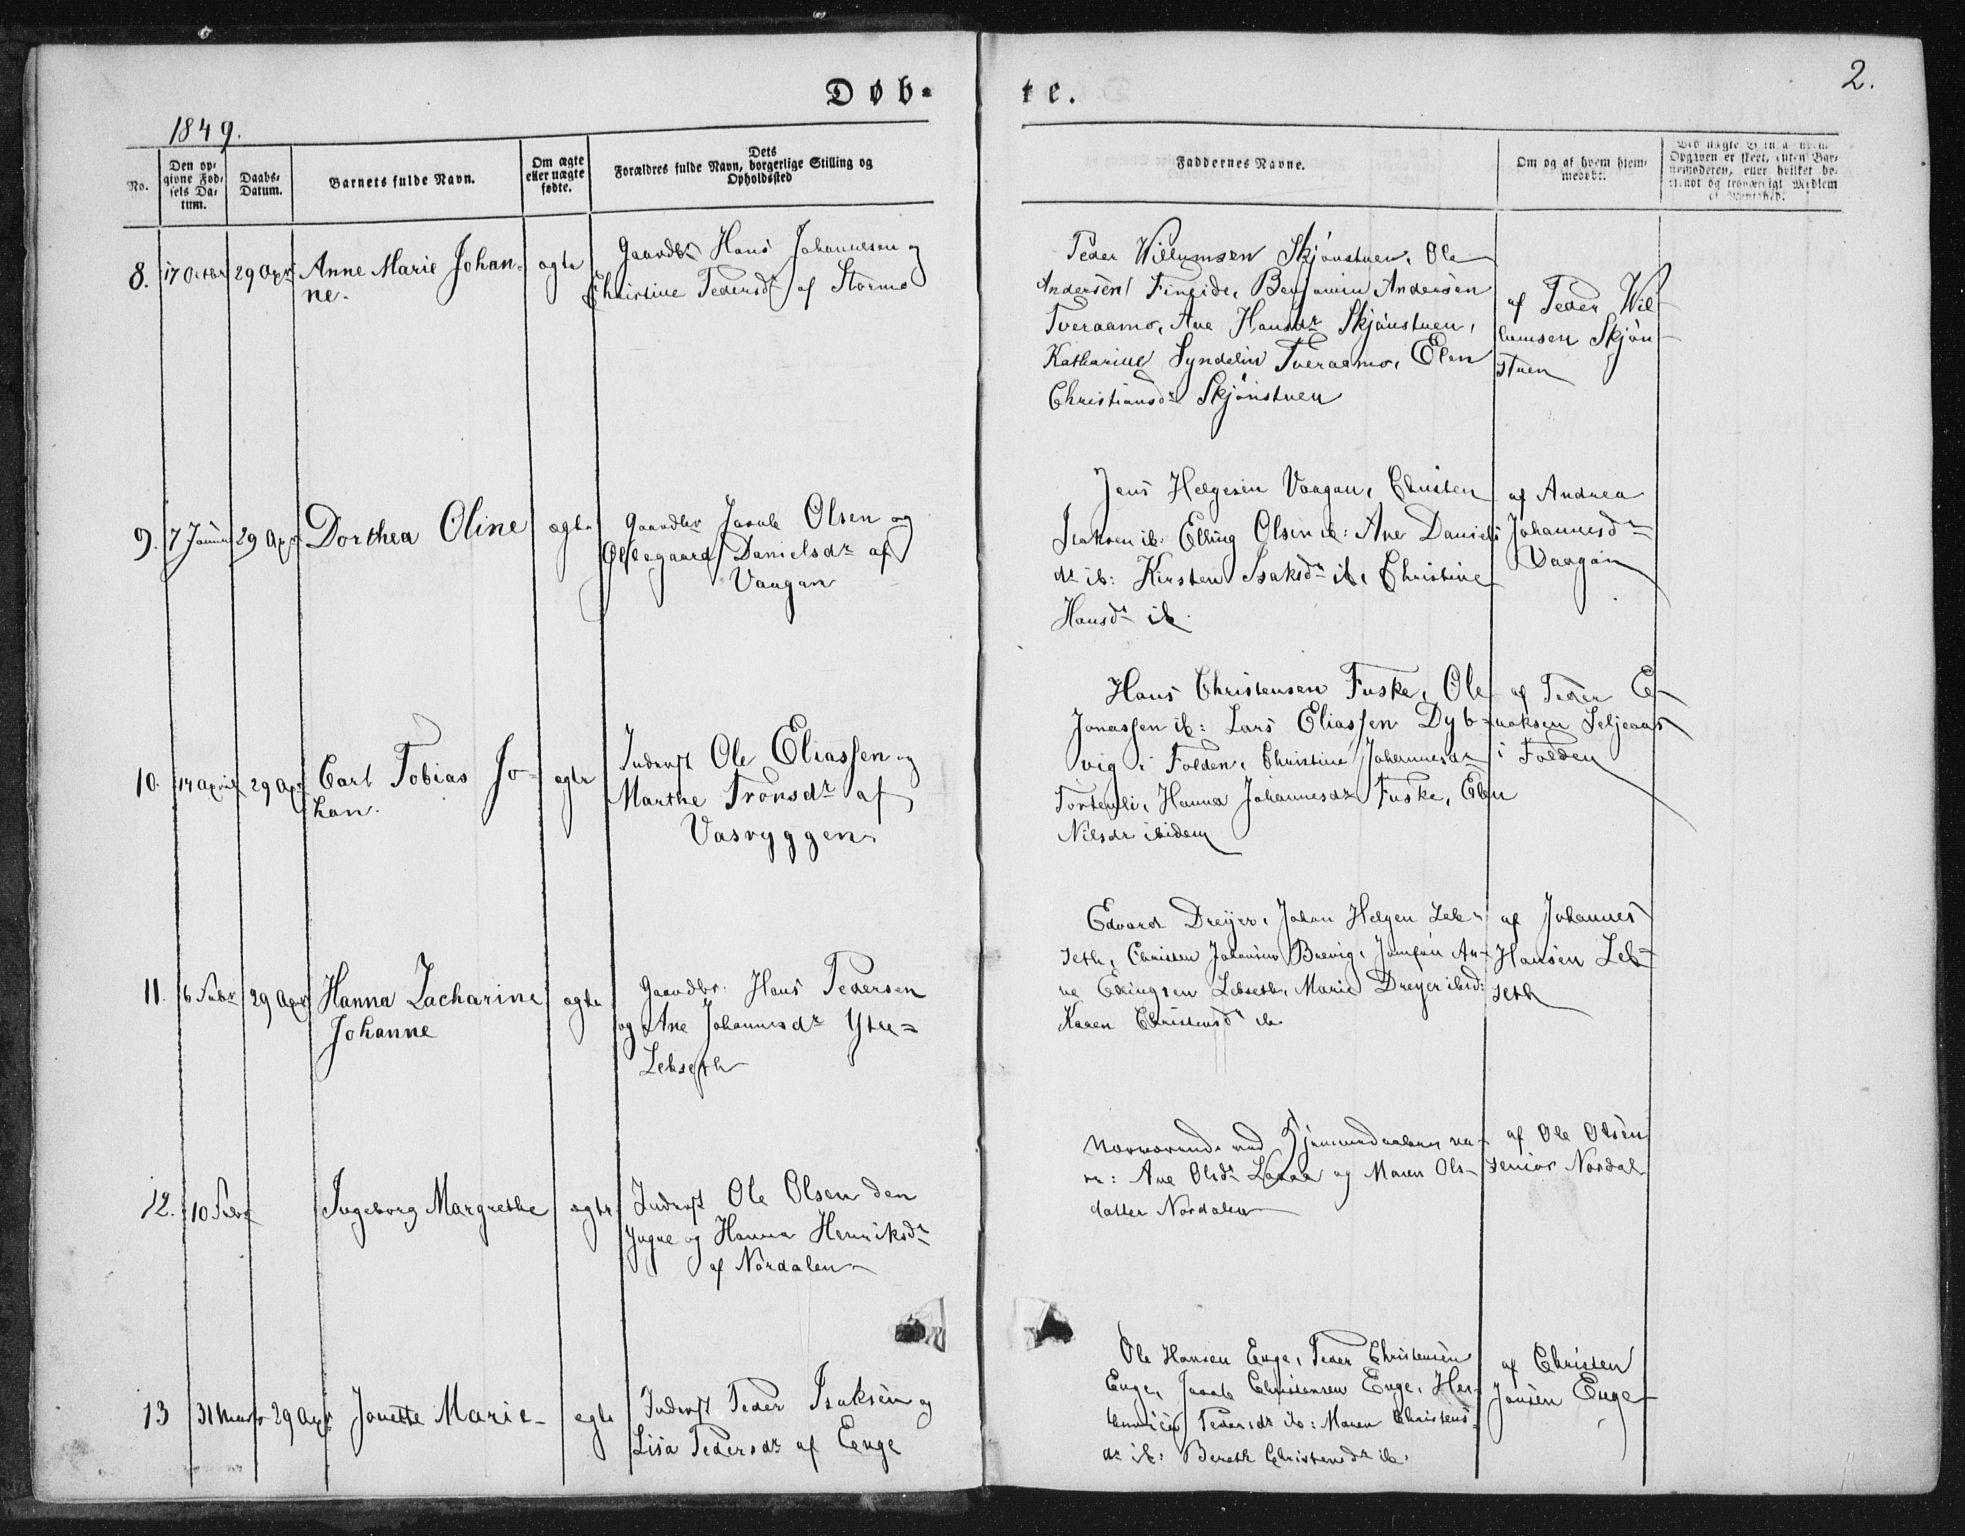 SAT, Ministerialprotokoller, klokkerbøker og fødselsregistre - Nordland, 852/L0738: Ministerialbok nr. 852A08, 1849-1865, s. 2